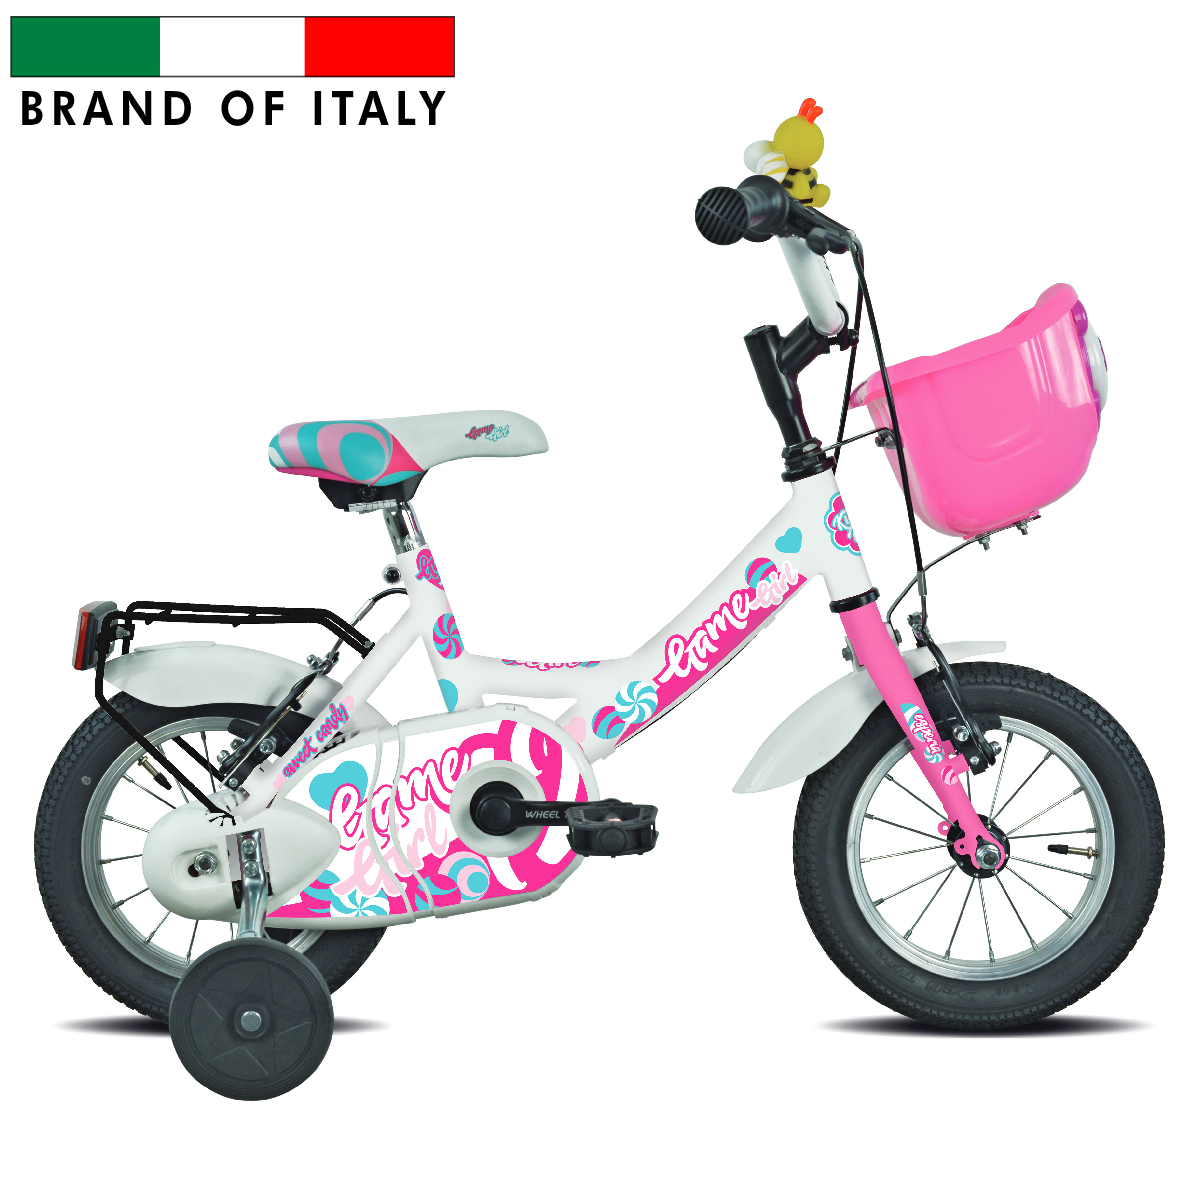 ESPERIA 9900 MASCOTTE MTB12 WHITE 109900D1 Pilsētas velosipēds